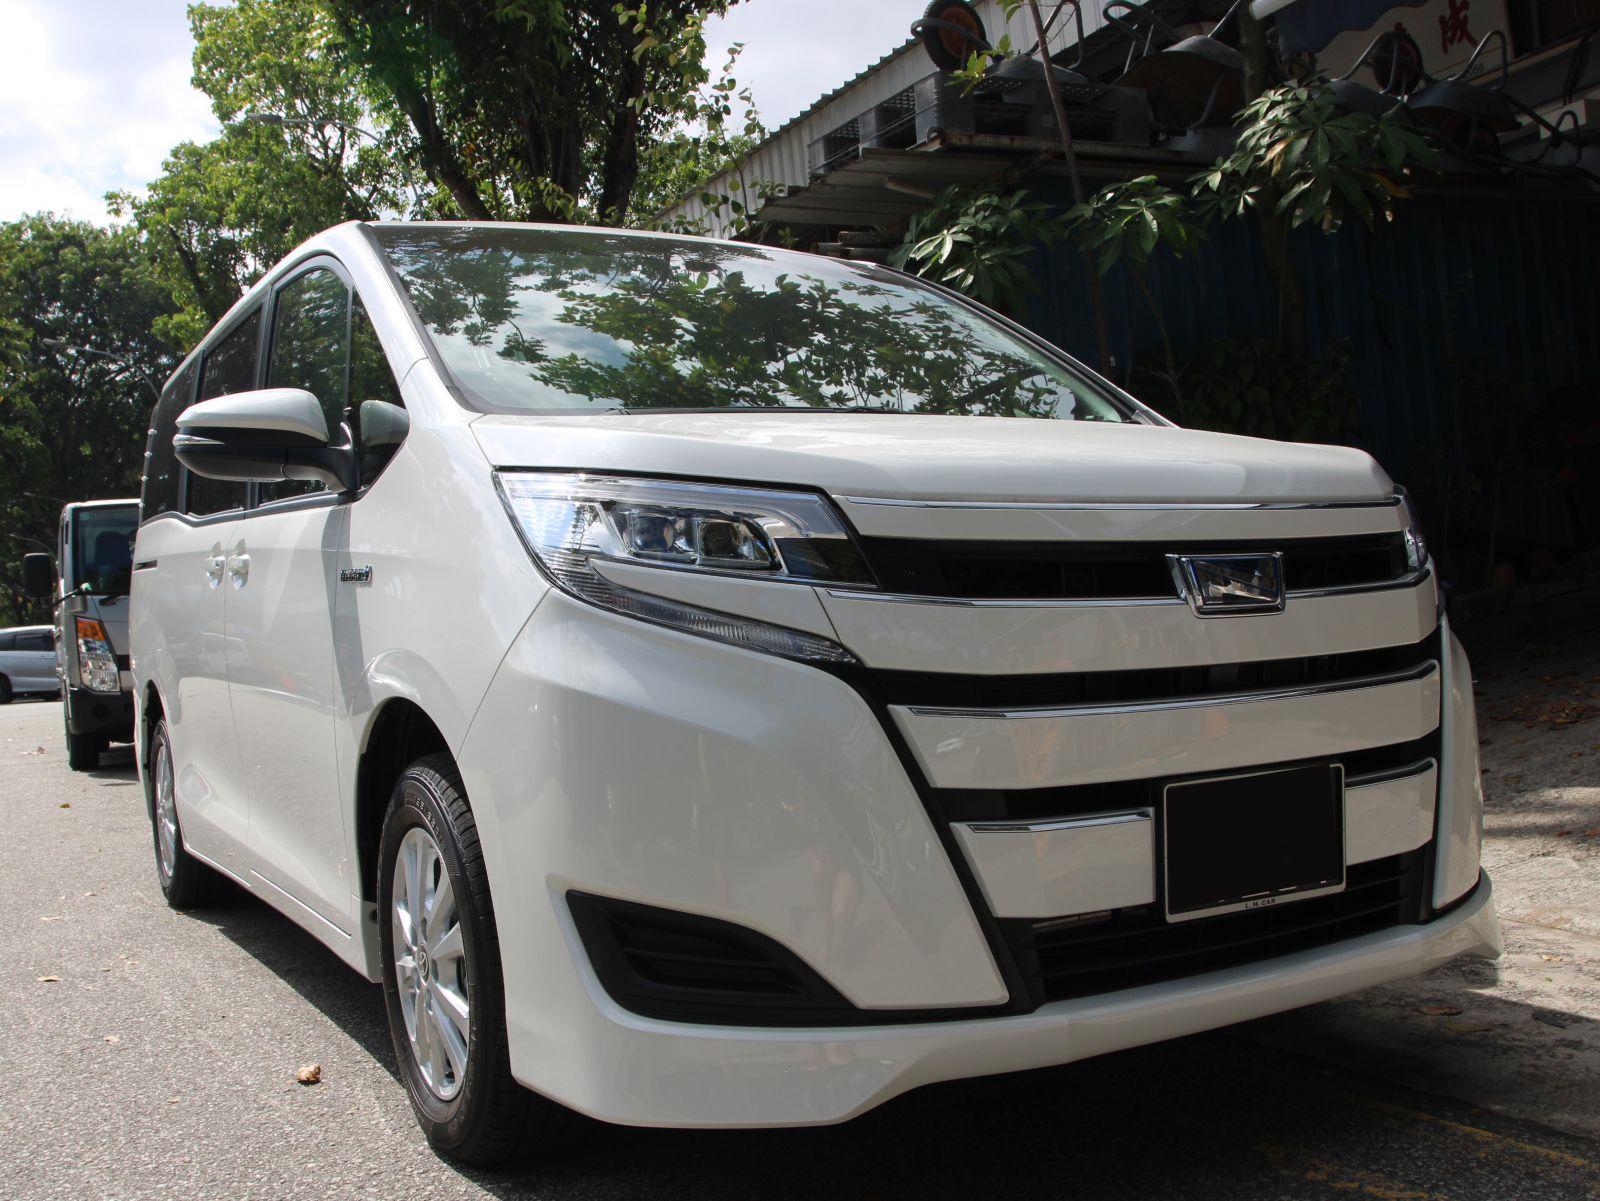 Toyota Noah Hybrid (PHV Private Hire Rental)